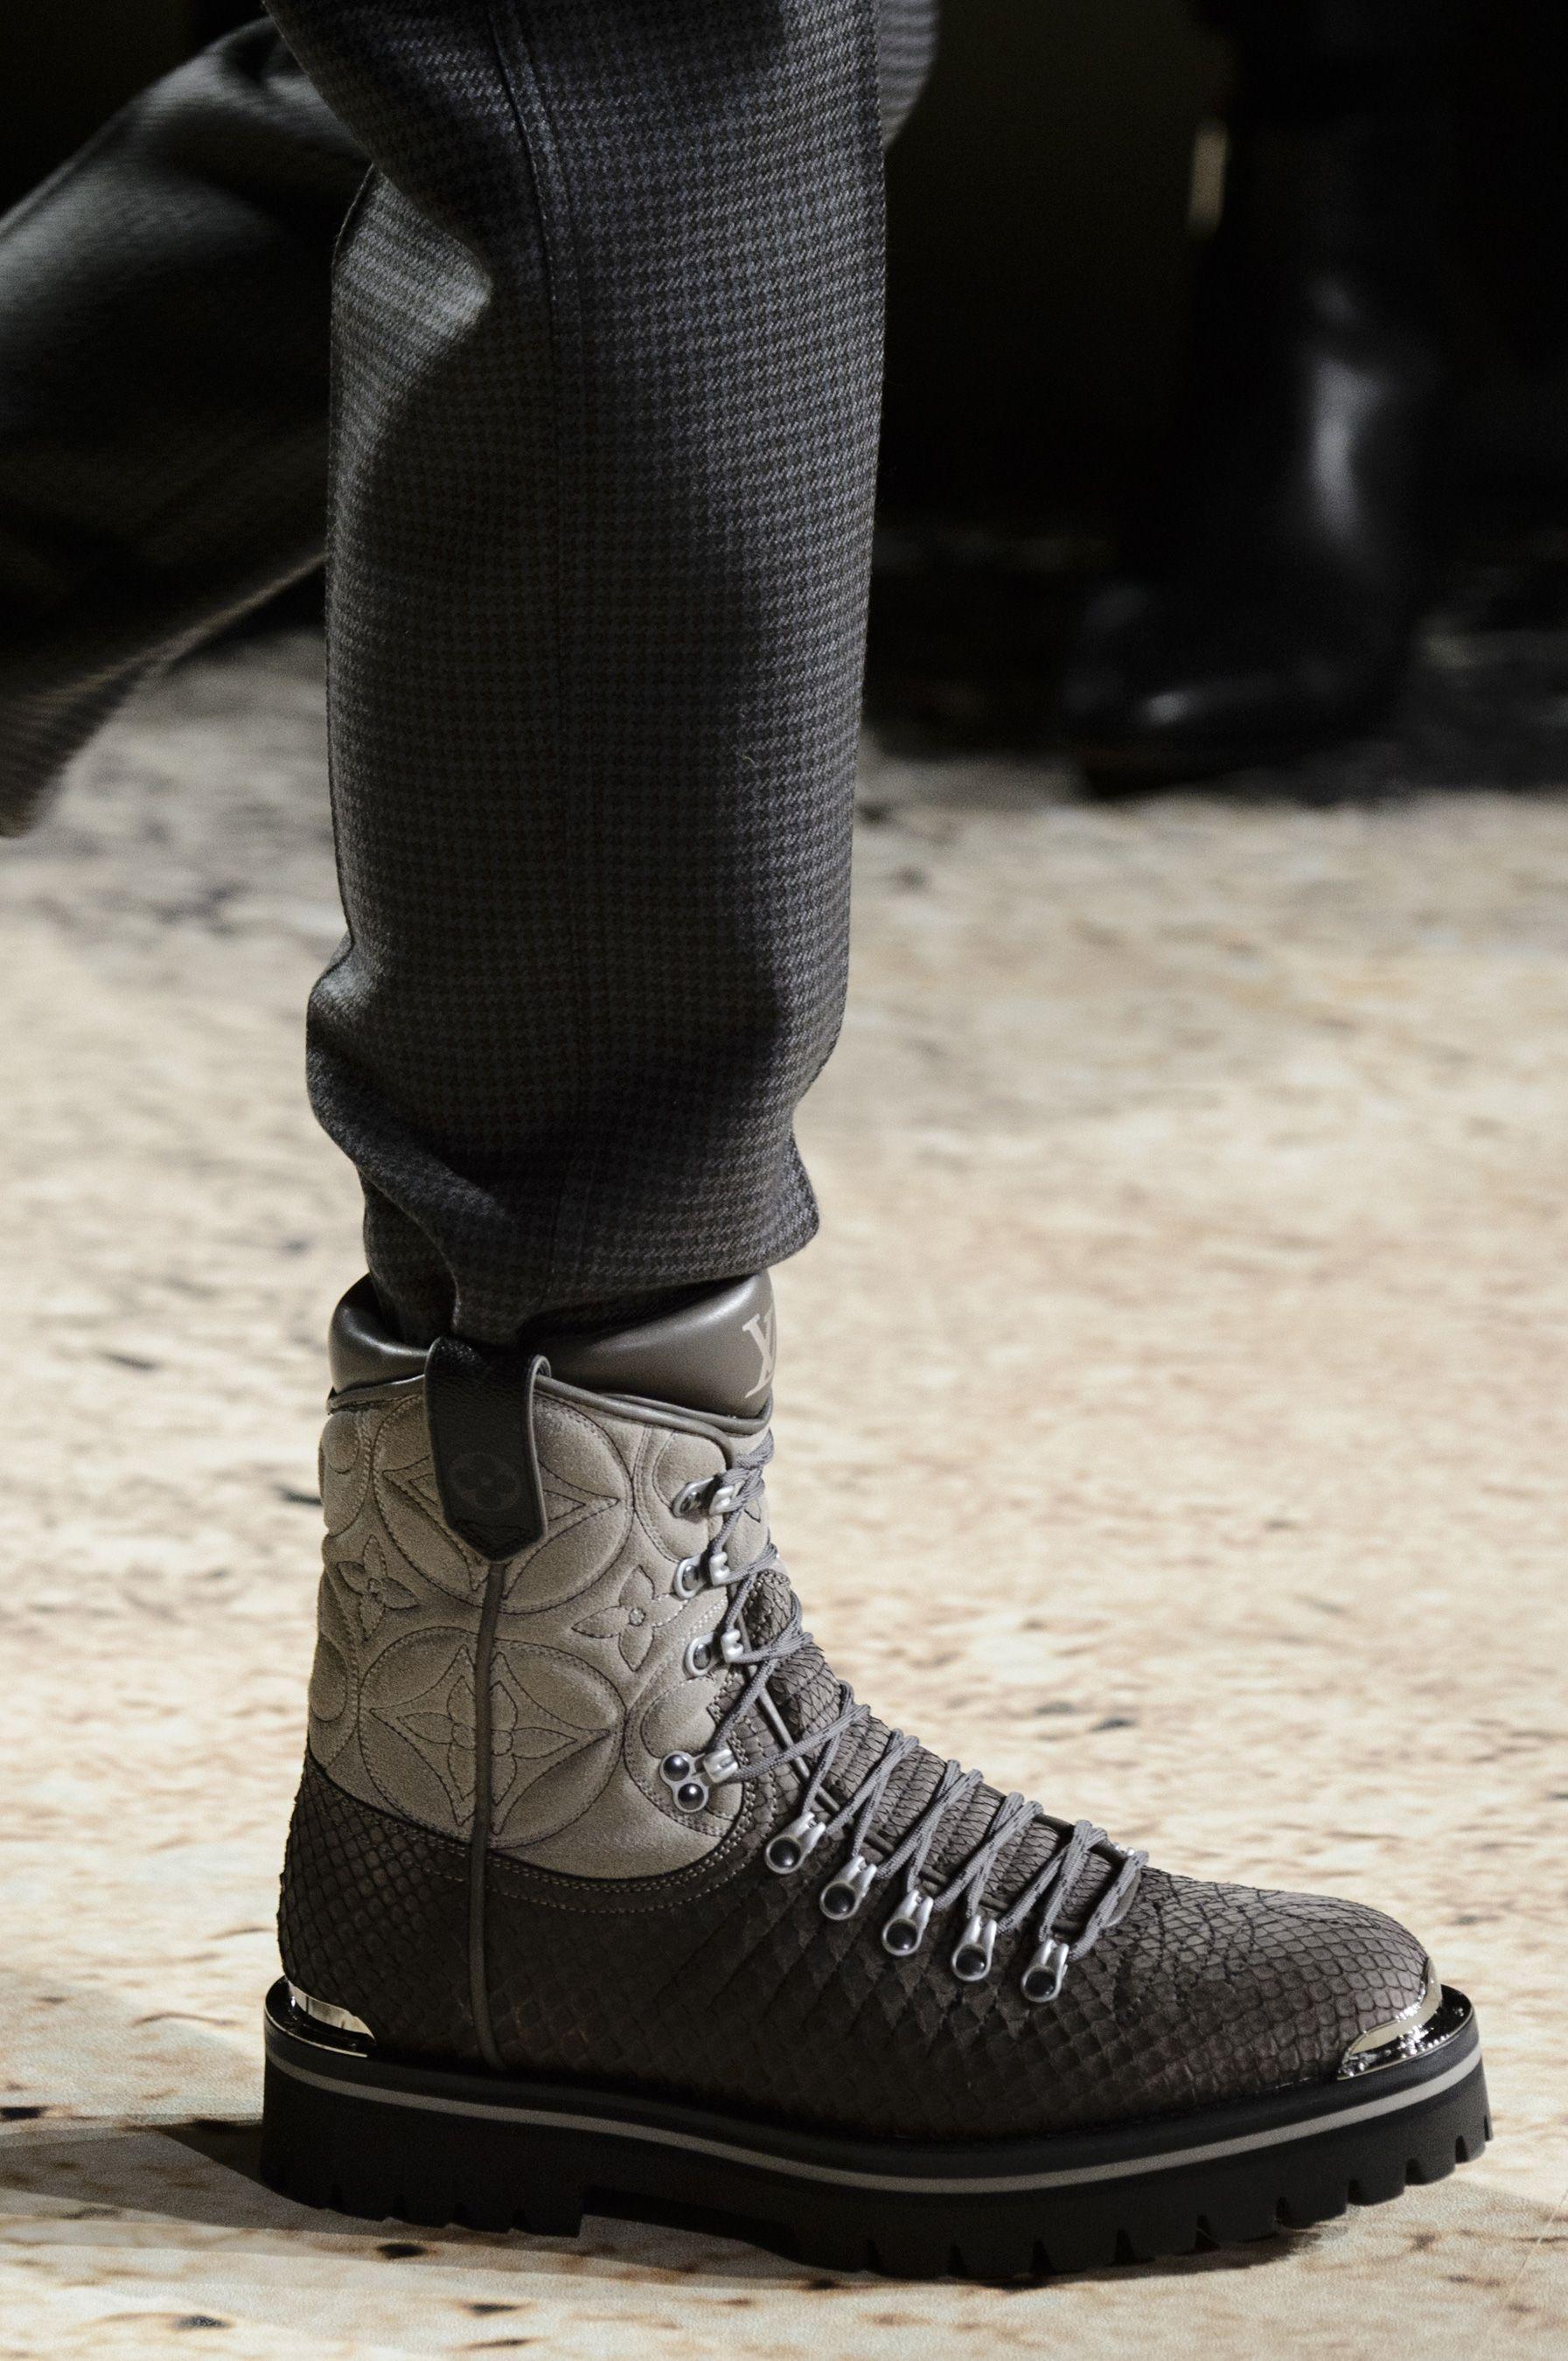 dd57ce34a1c36 Louis Vuitton Fall 2018 Men's Fashion Show Details - The Impression  #MensFashion2018 Mens Boots Fashion